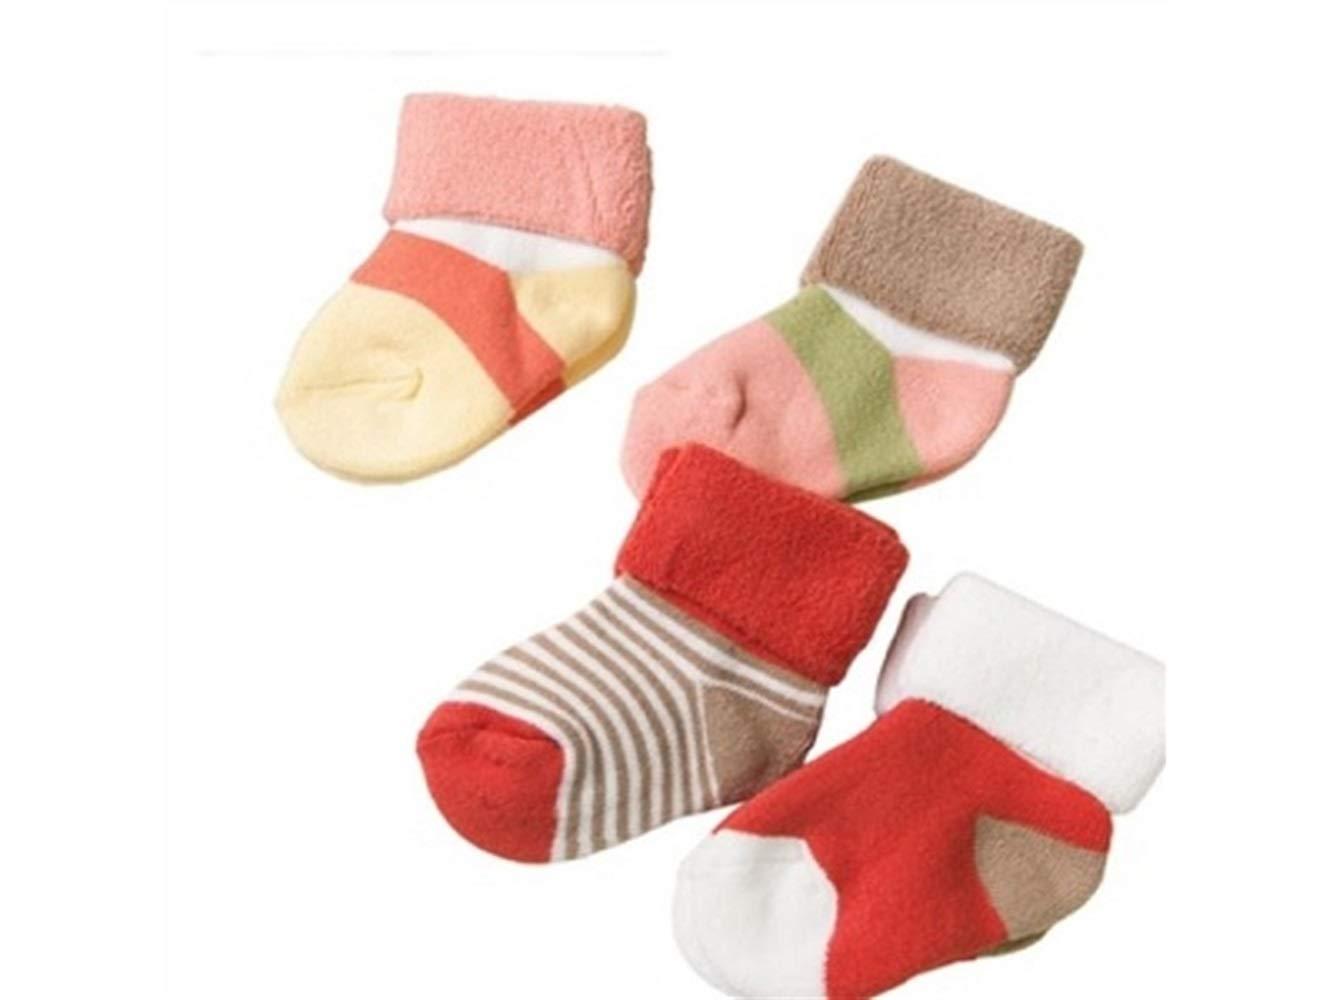 Gelaiken World Christmas 4 Pairs Children Cotton Socks Kids Autumn and Winter Cotton Loose Stripe Short Tube Socks(Multicolor)